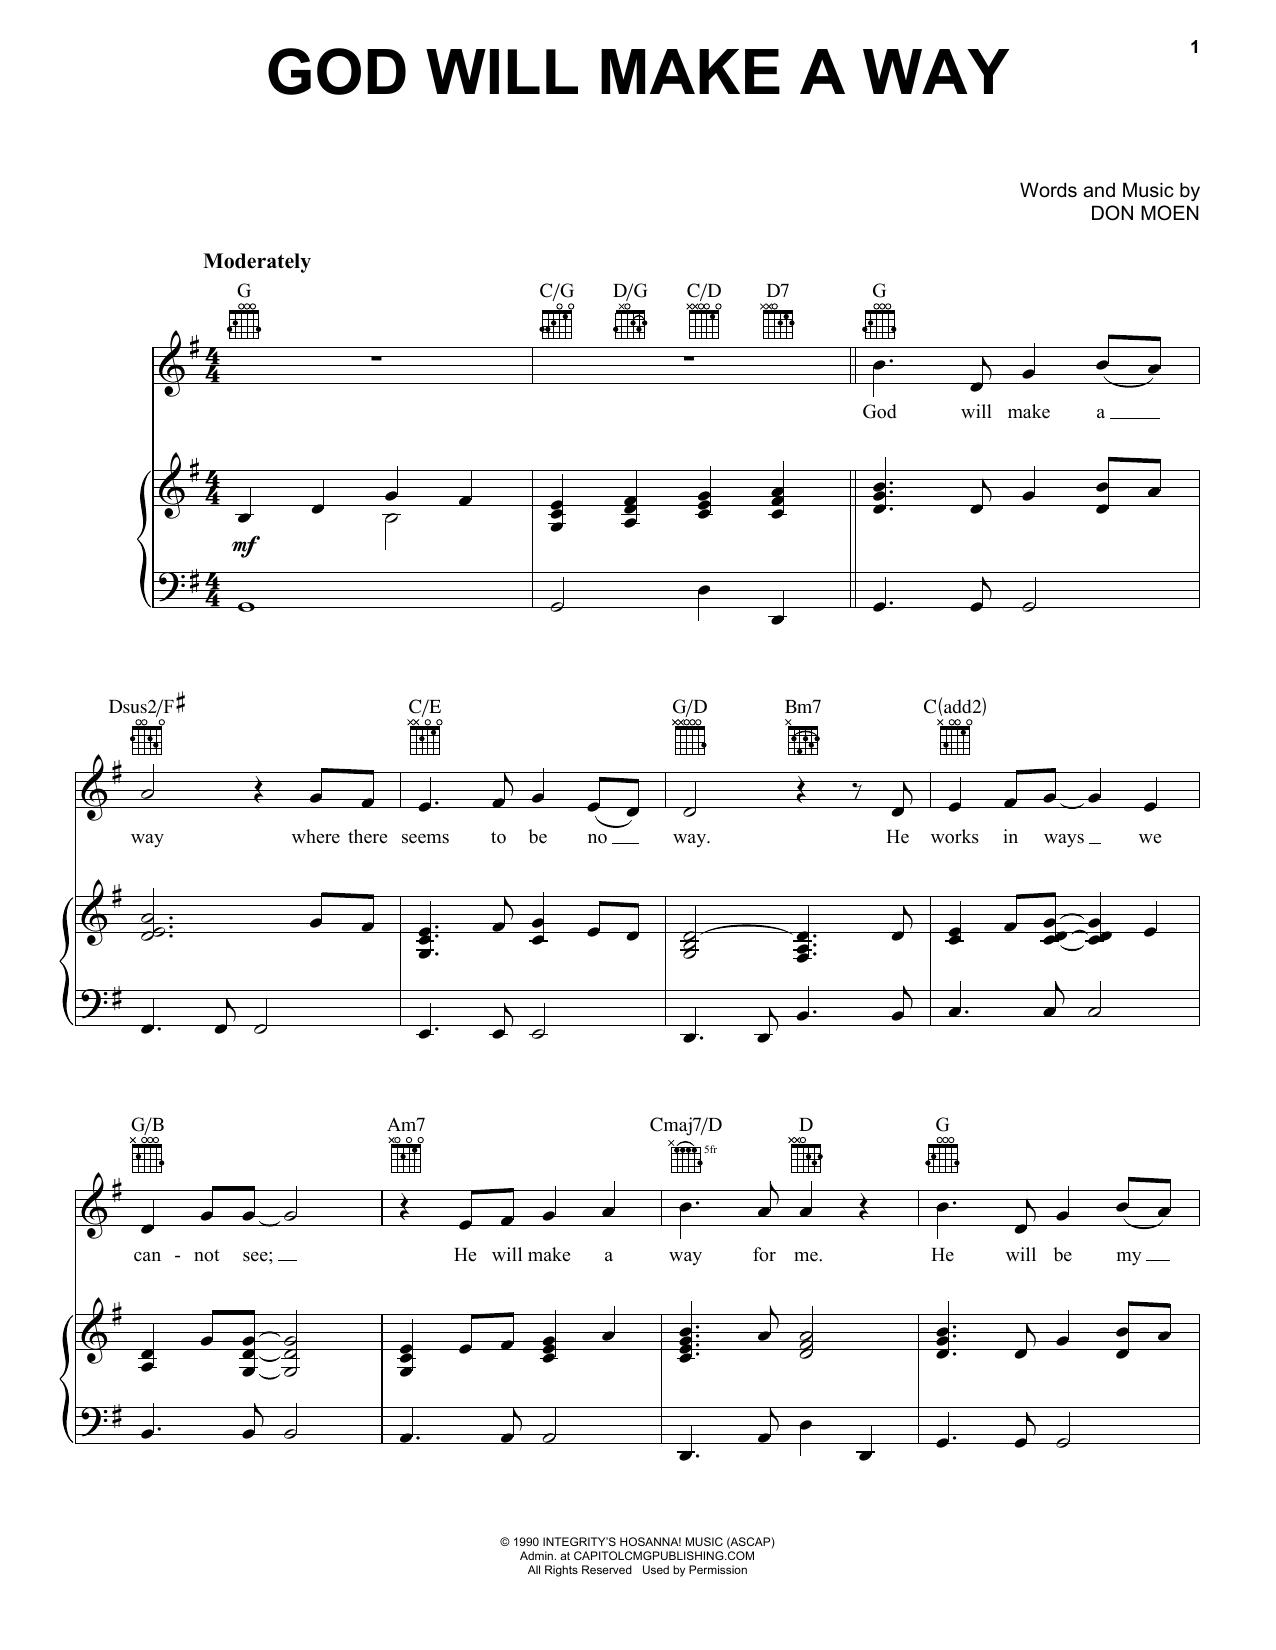 Sheet Music Digital Files To Print Licensed Don Moen Digital Sheet